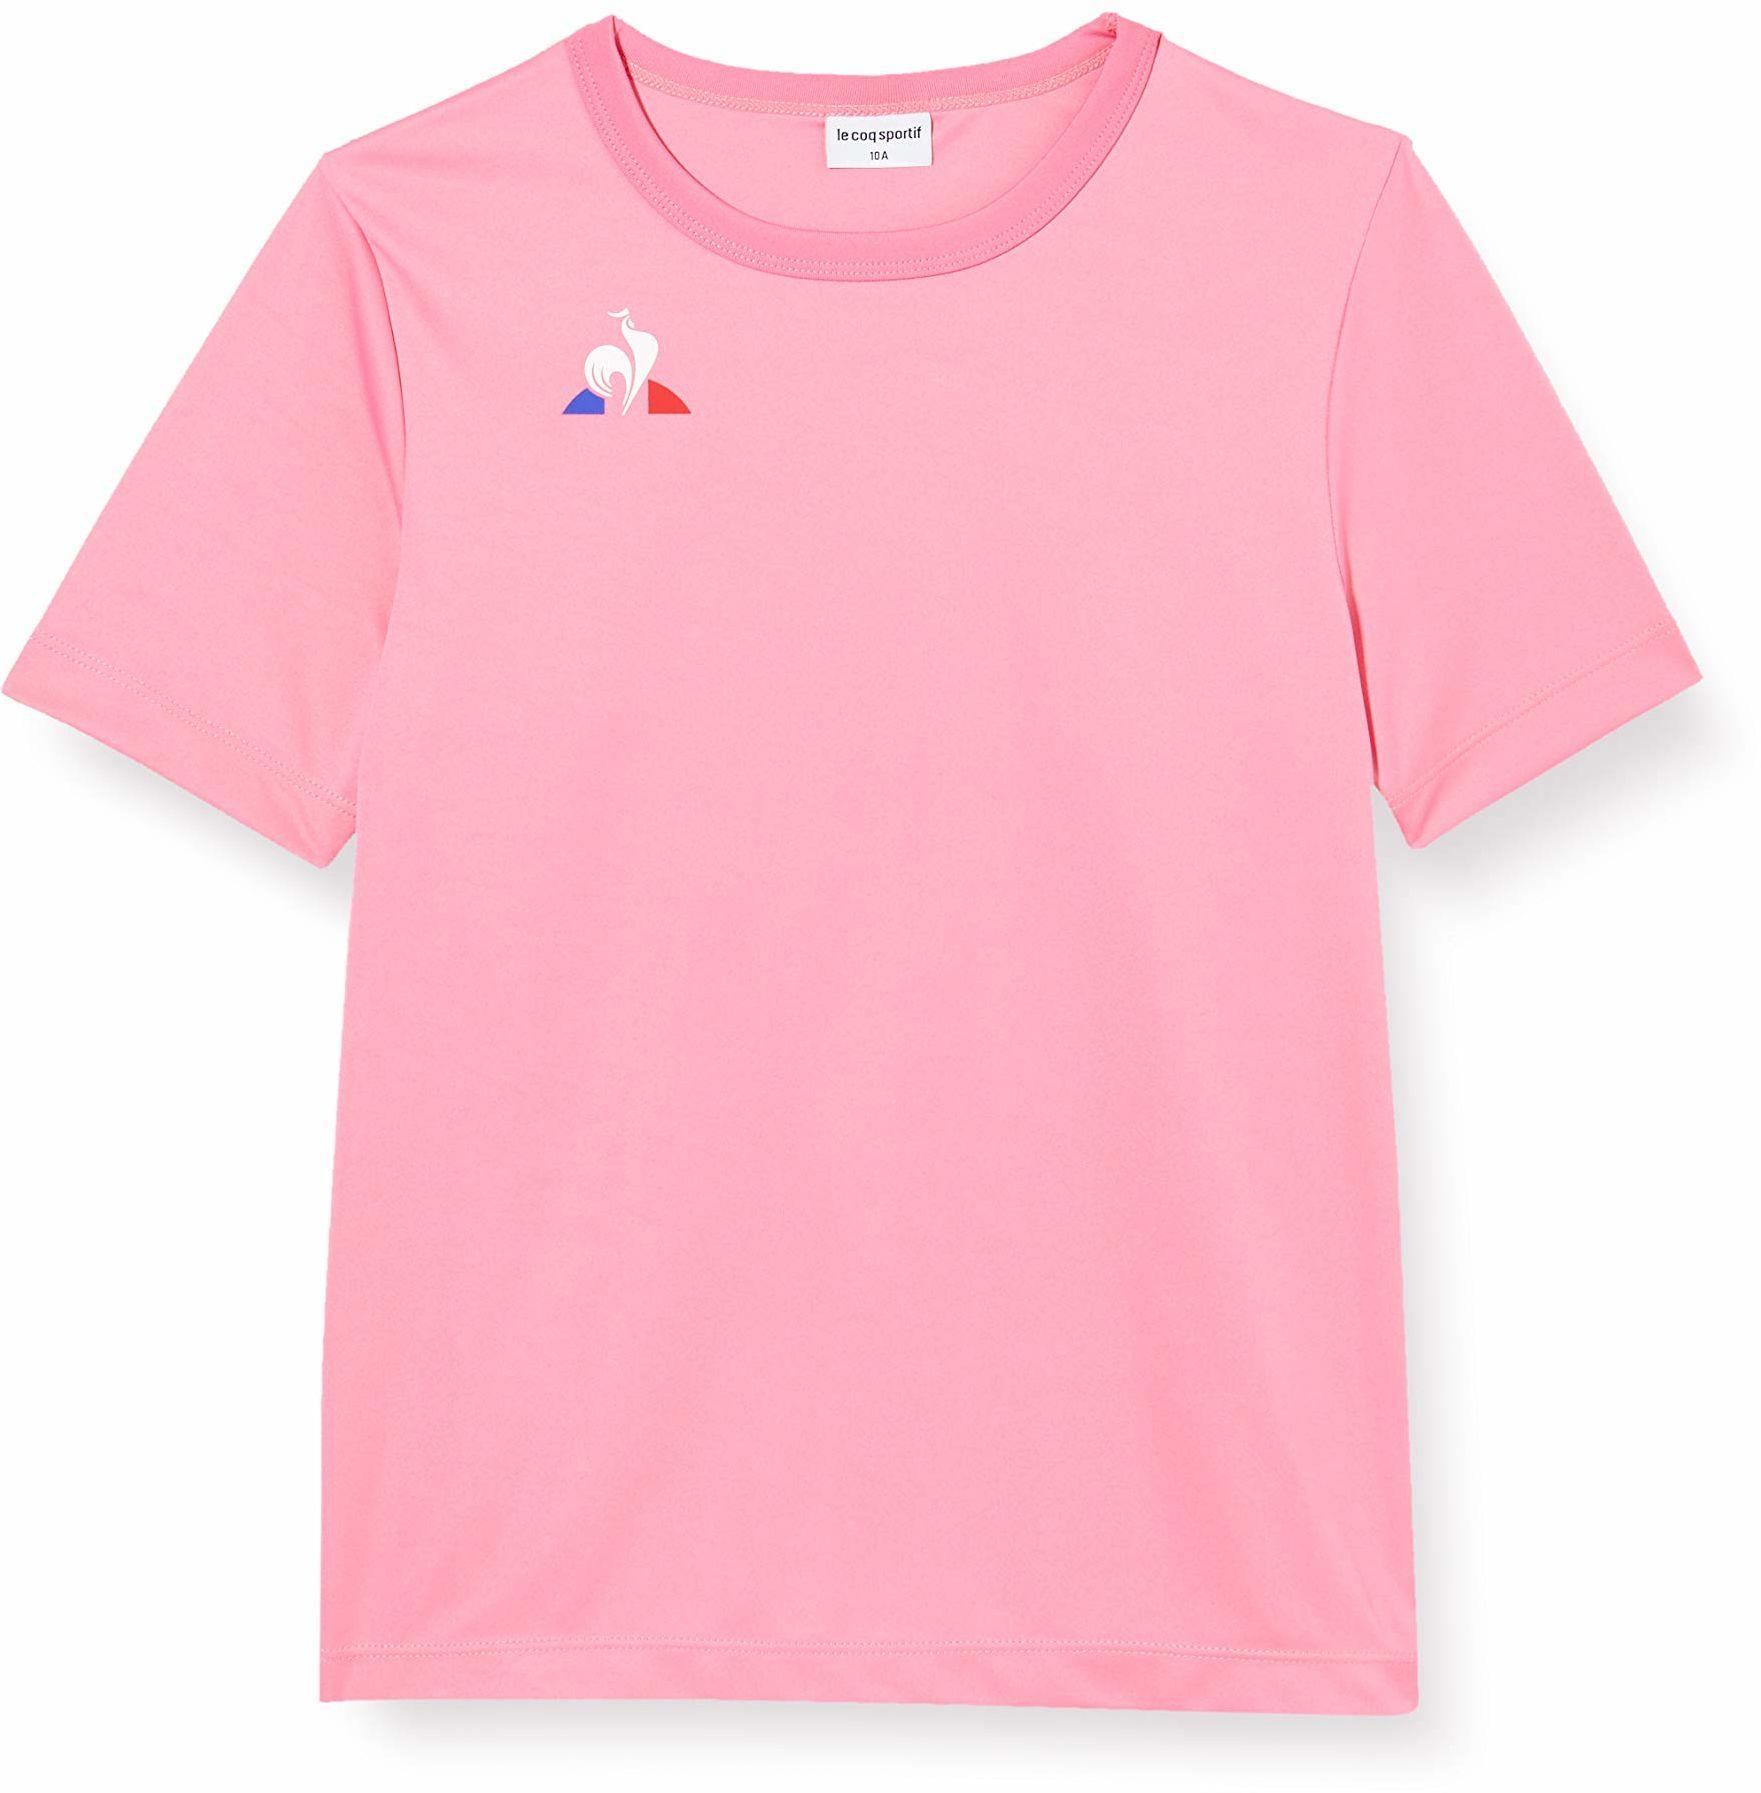 Le Coq Sportif N 1 Maillot Match Enfant Mc Carnati T-Shirt, różowy karnation, 6A